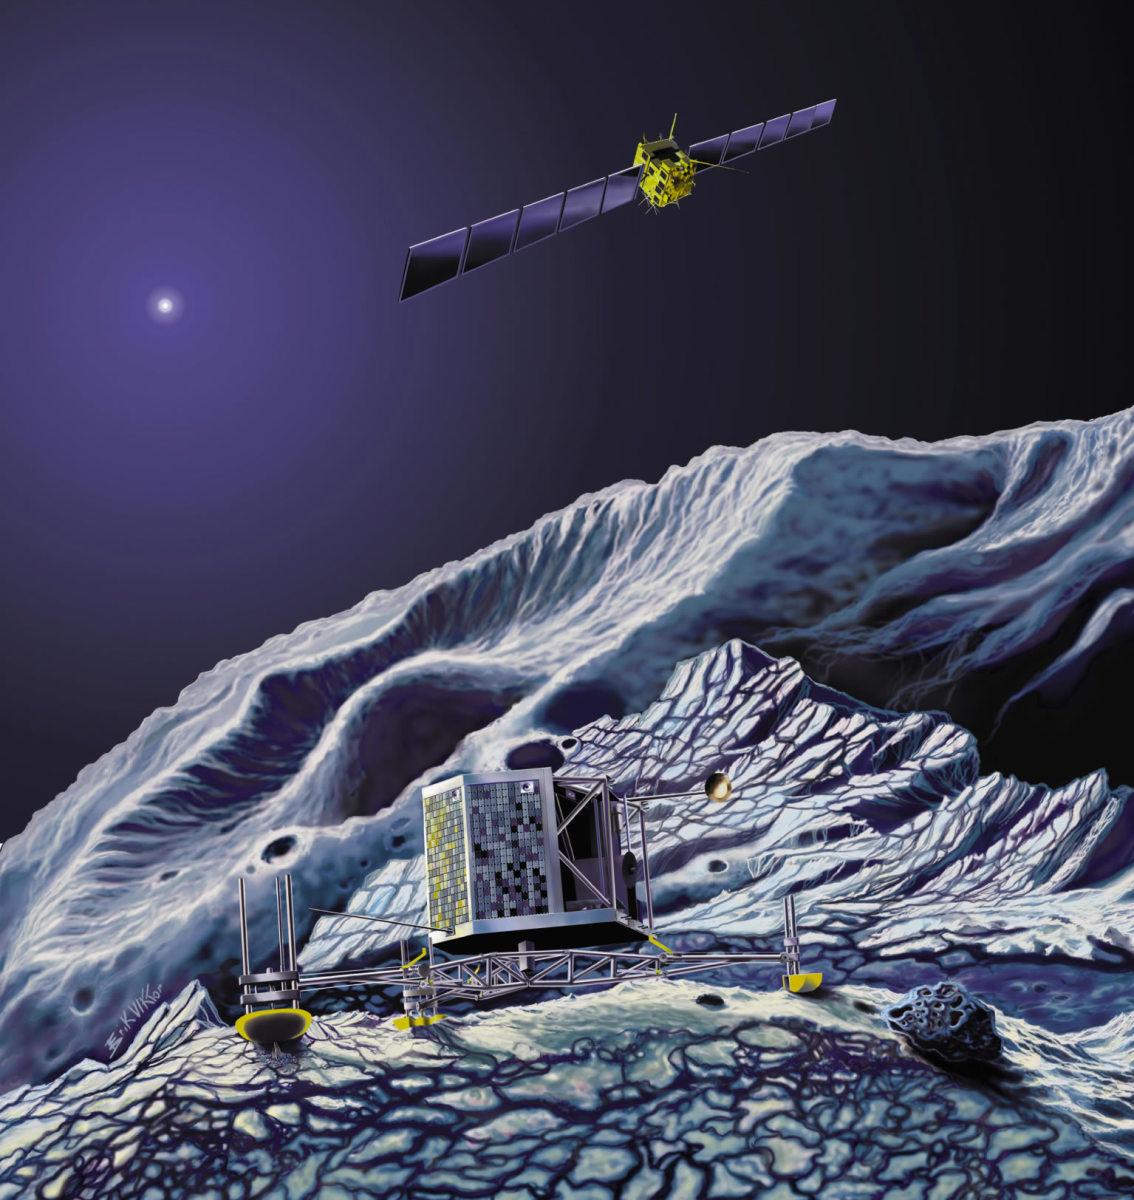 rosetta-and-the-landing-of-philae-on-comet-churyumov-gerasimenko